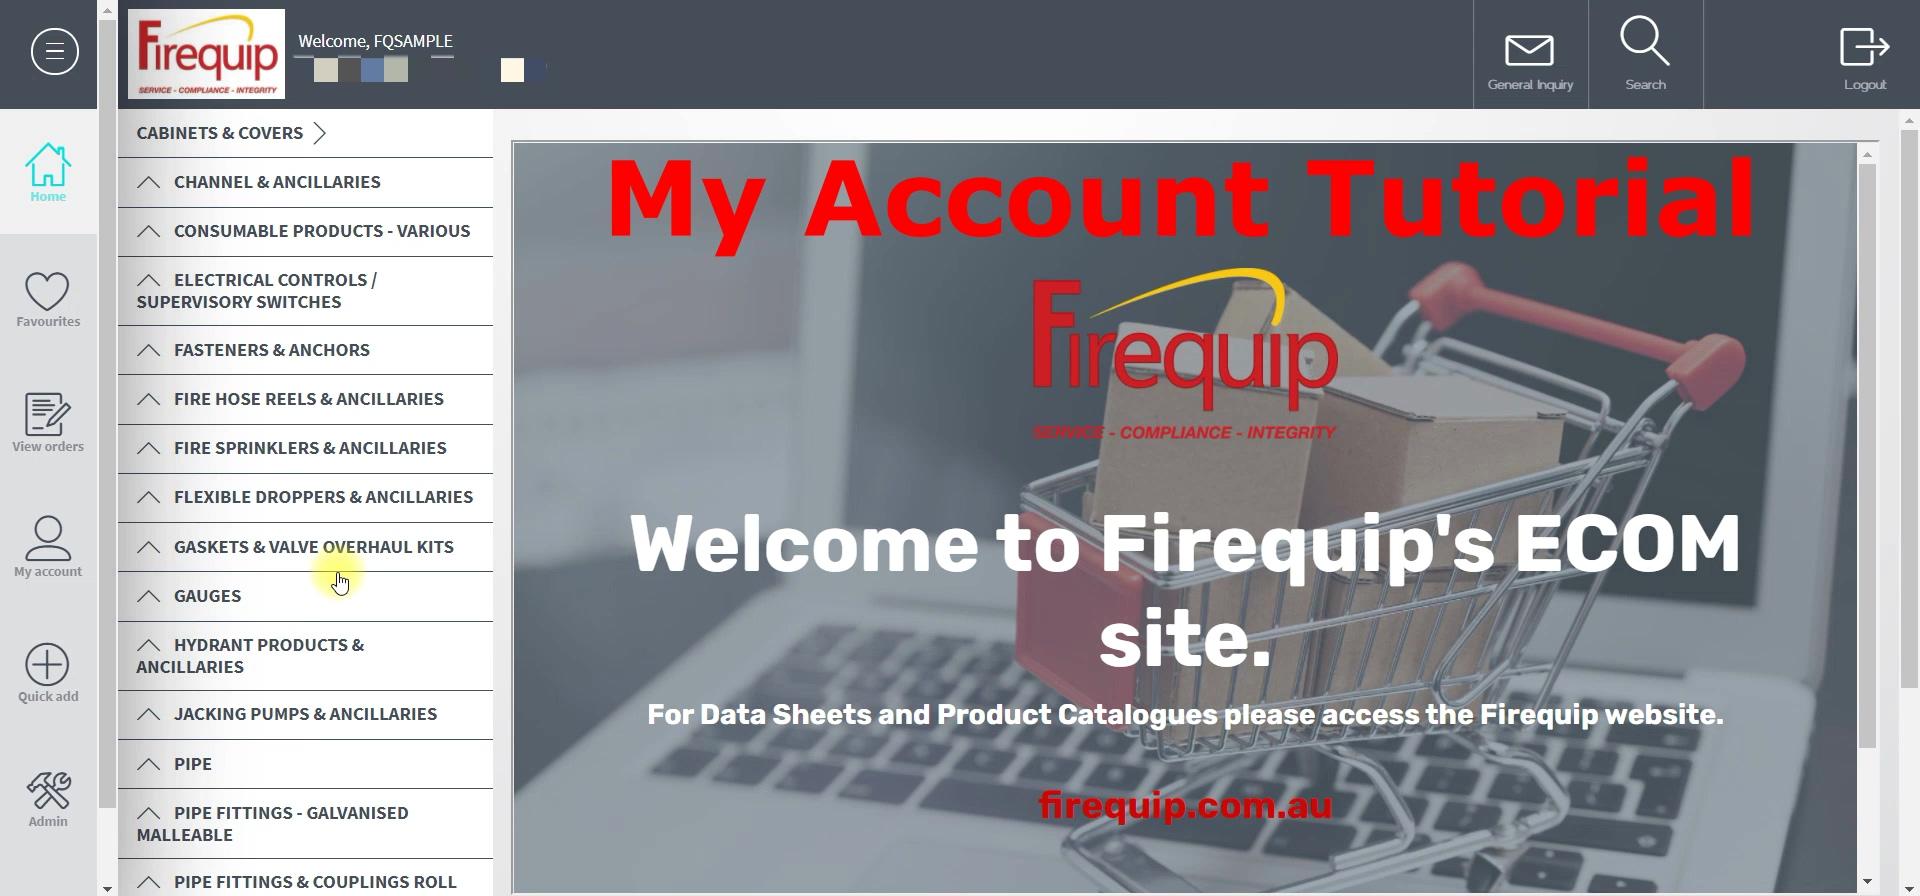 ECOM - My Account Tutorial